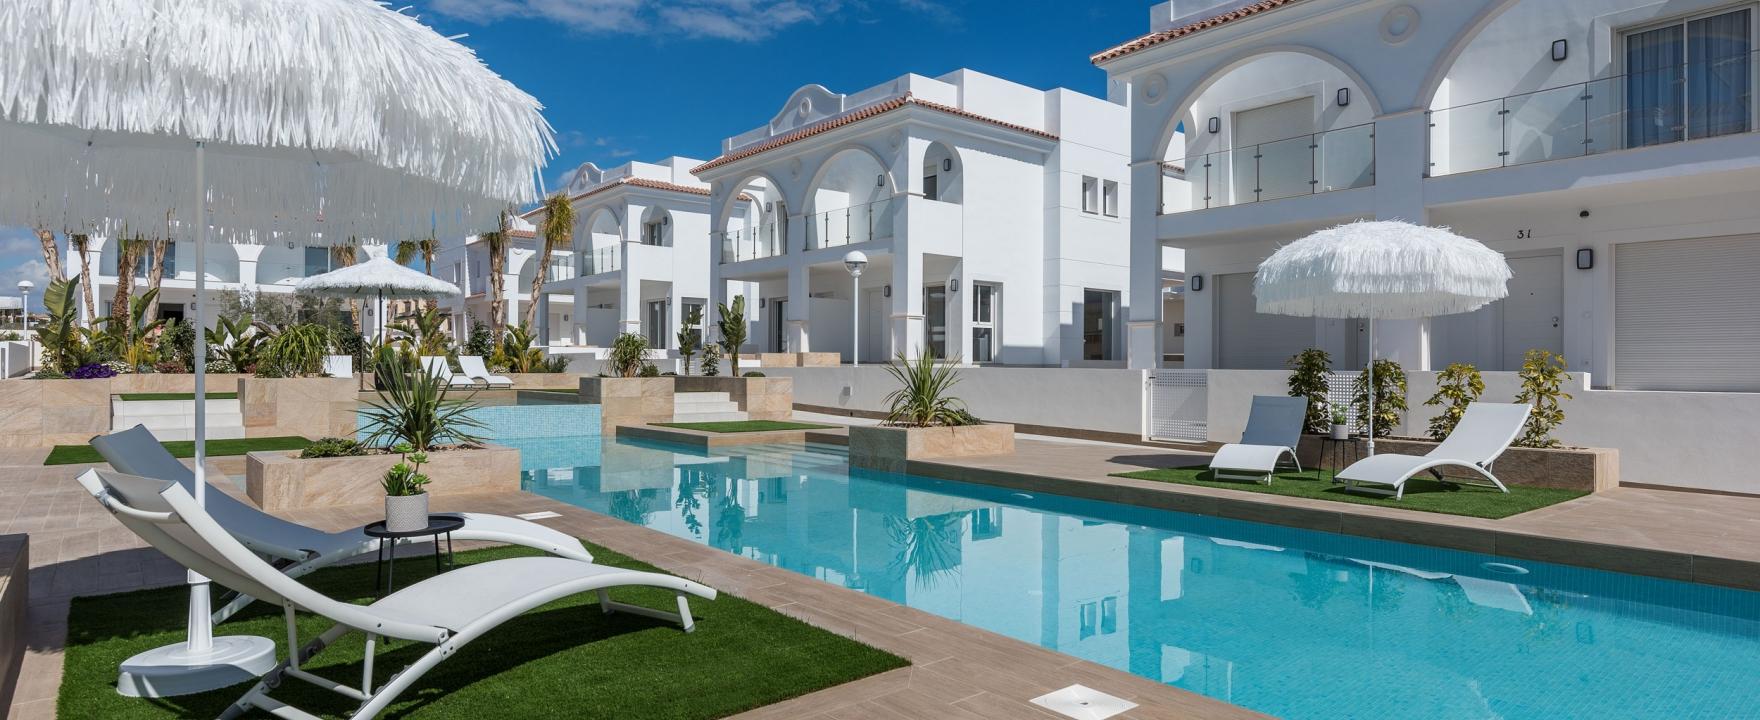 SPANIEN COSTA BLANCA – Doña Pepa (Quesada) Neue Reihenhäuser im mediterranen Stil